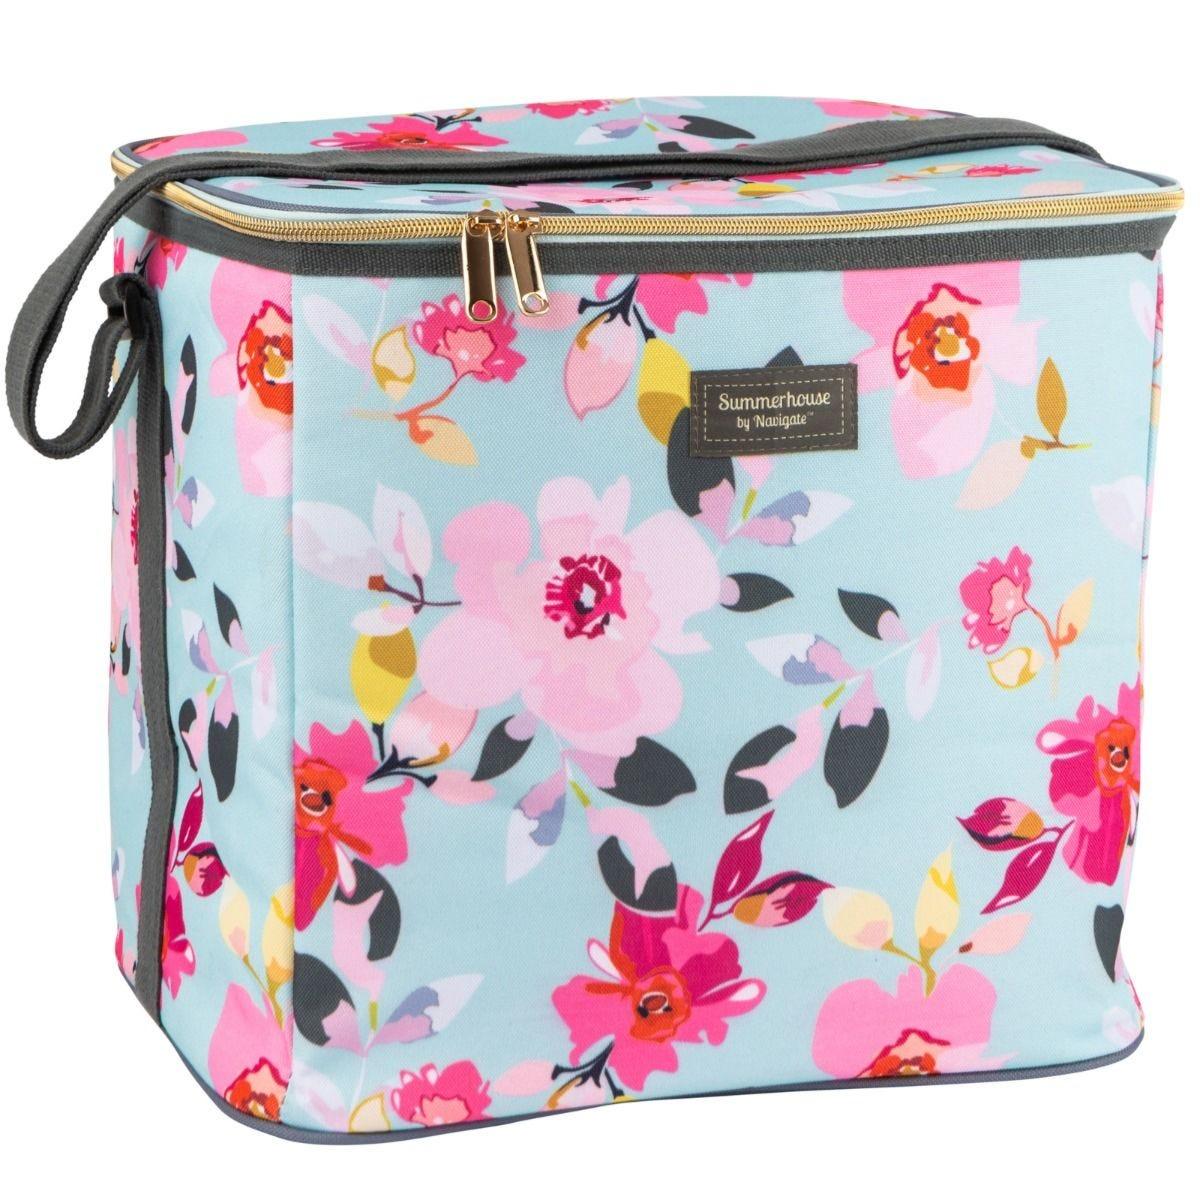 Summerhouse Gardenia Floral 20L Family Cool Bag - Sky Blue